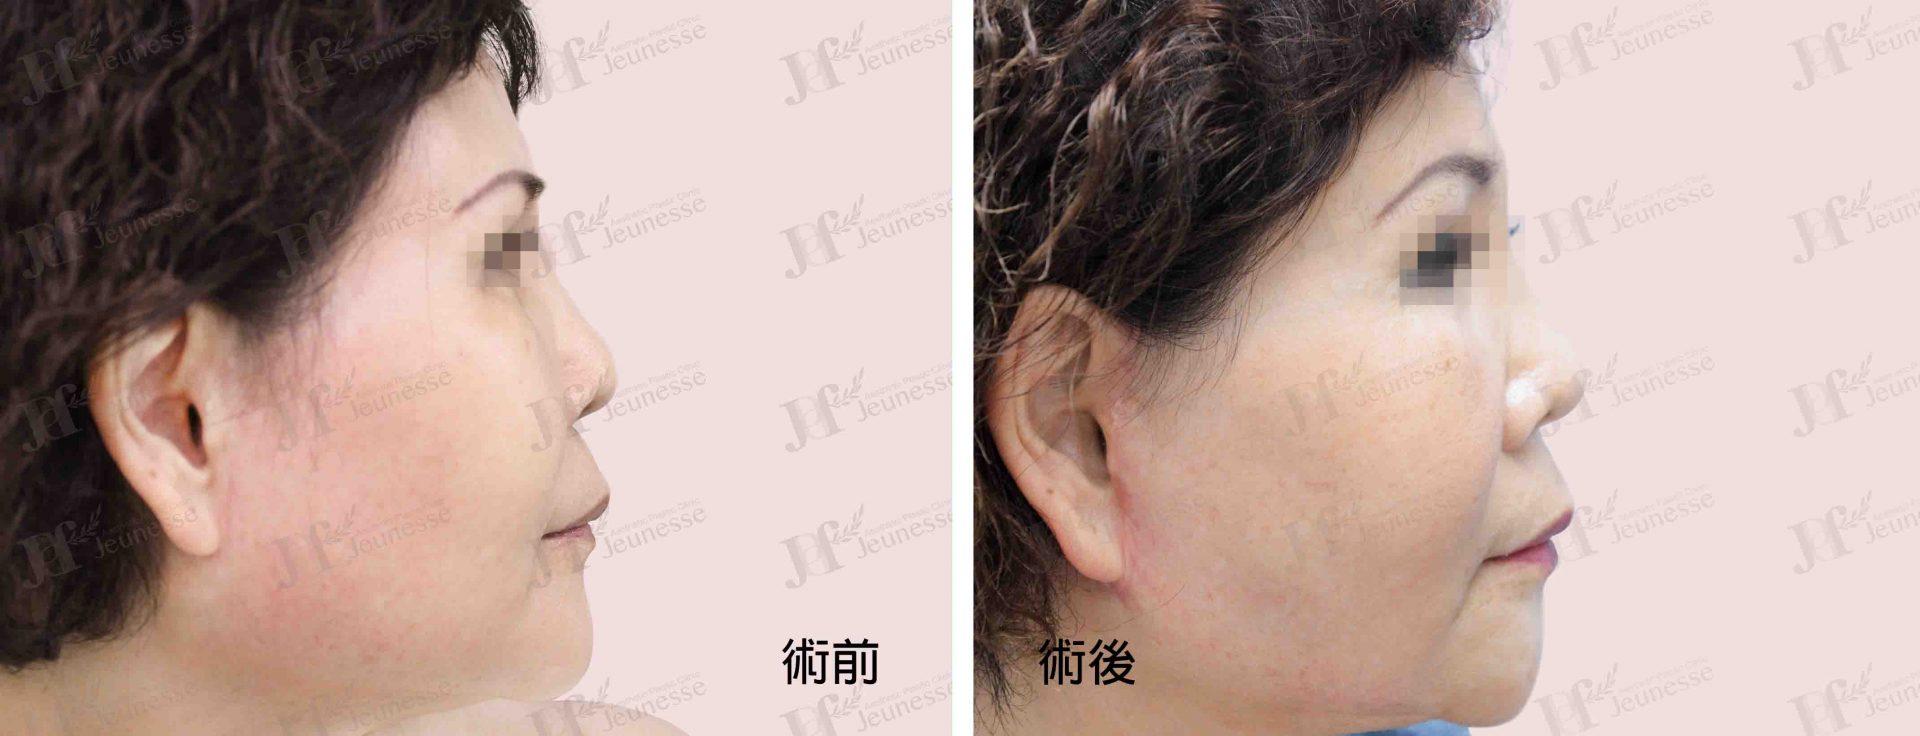 Midface lifting case 2 側面-浮水印